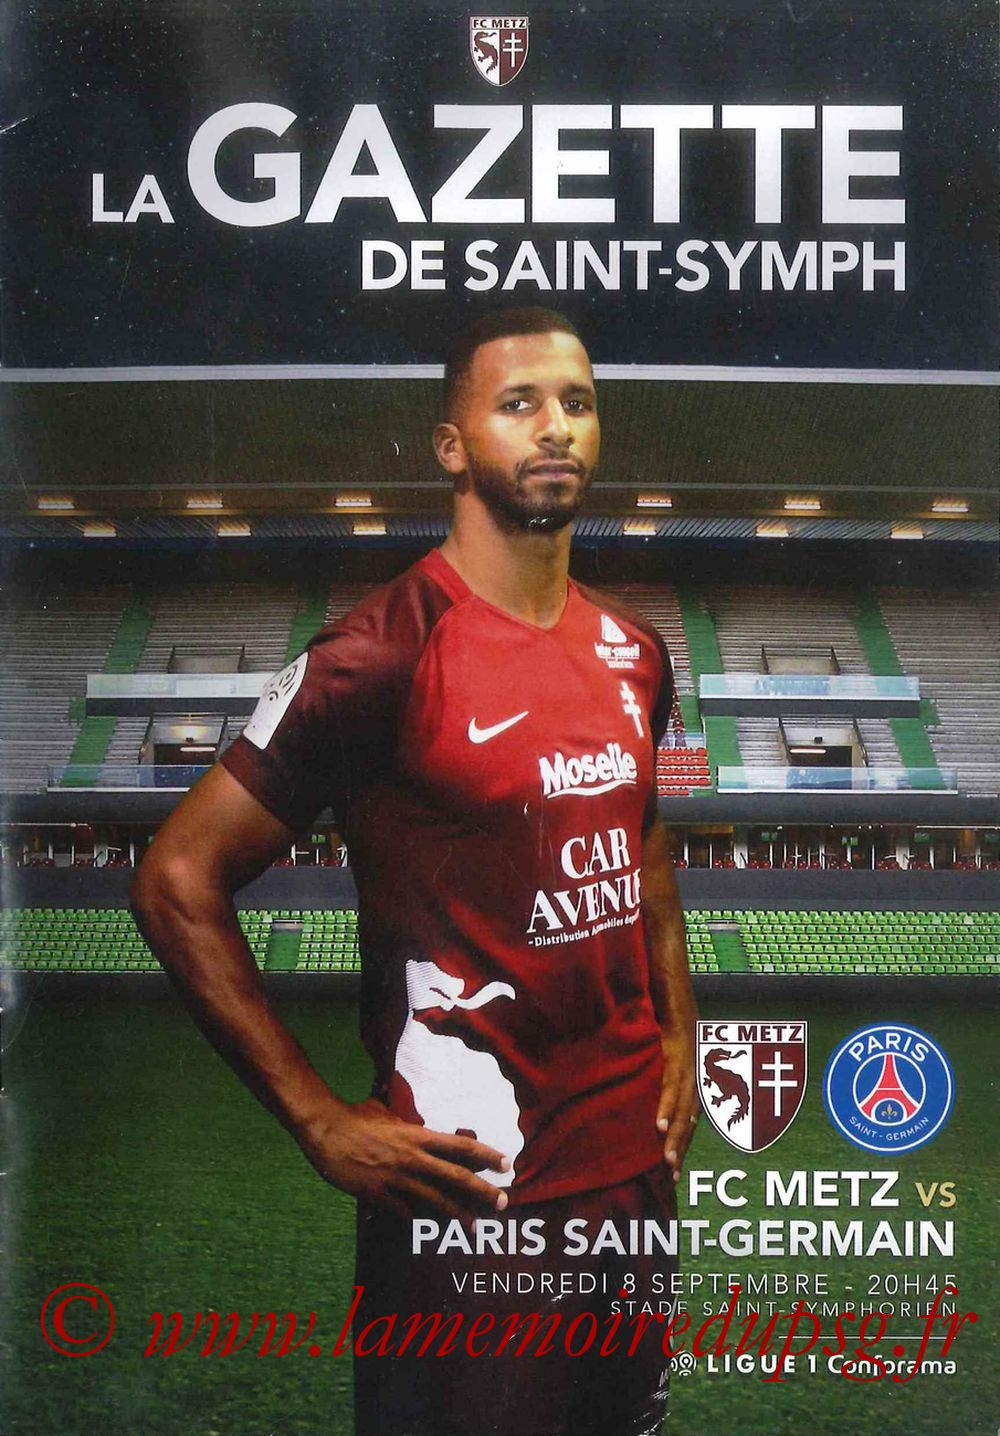 2017-09-08  Metz-PSG ((5ème L1, La Gazette de Saint-Symph)